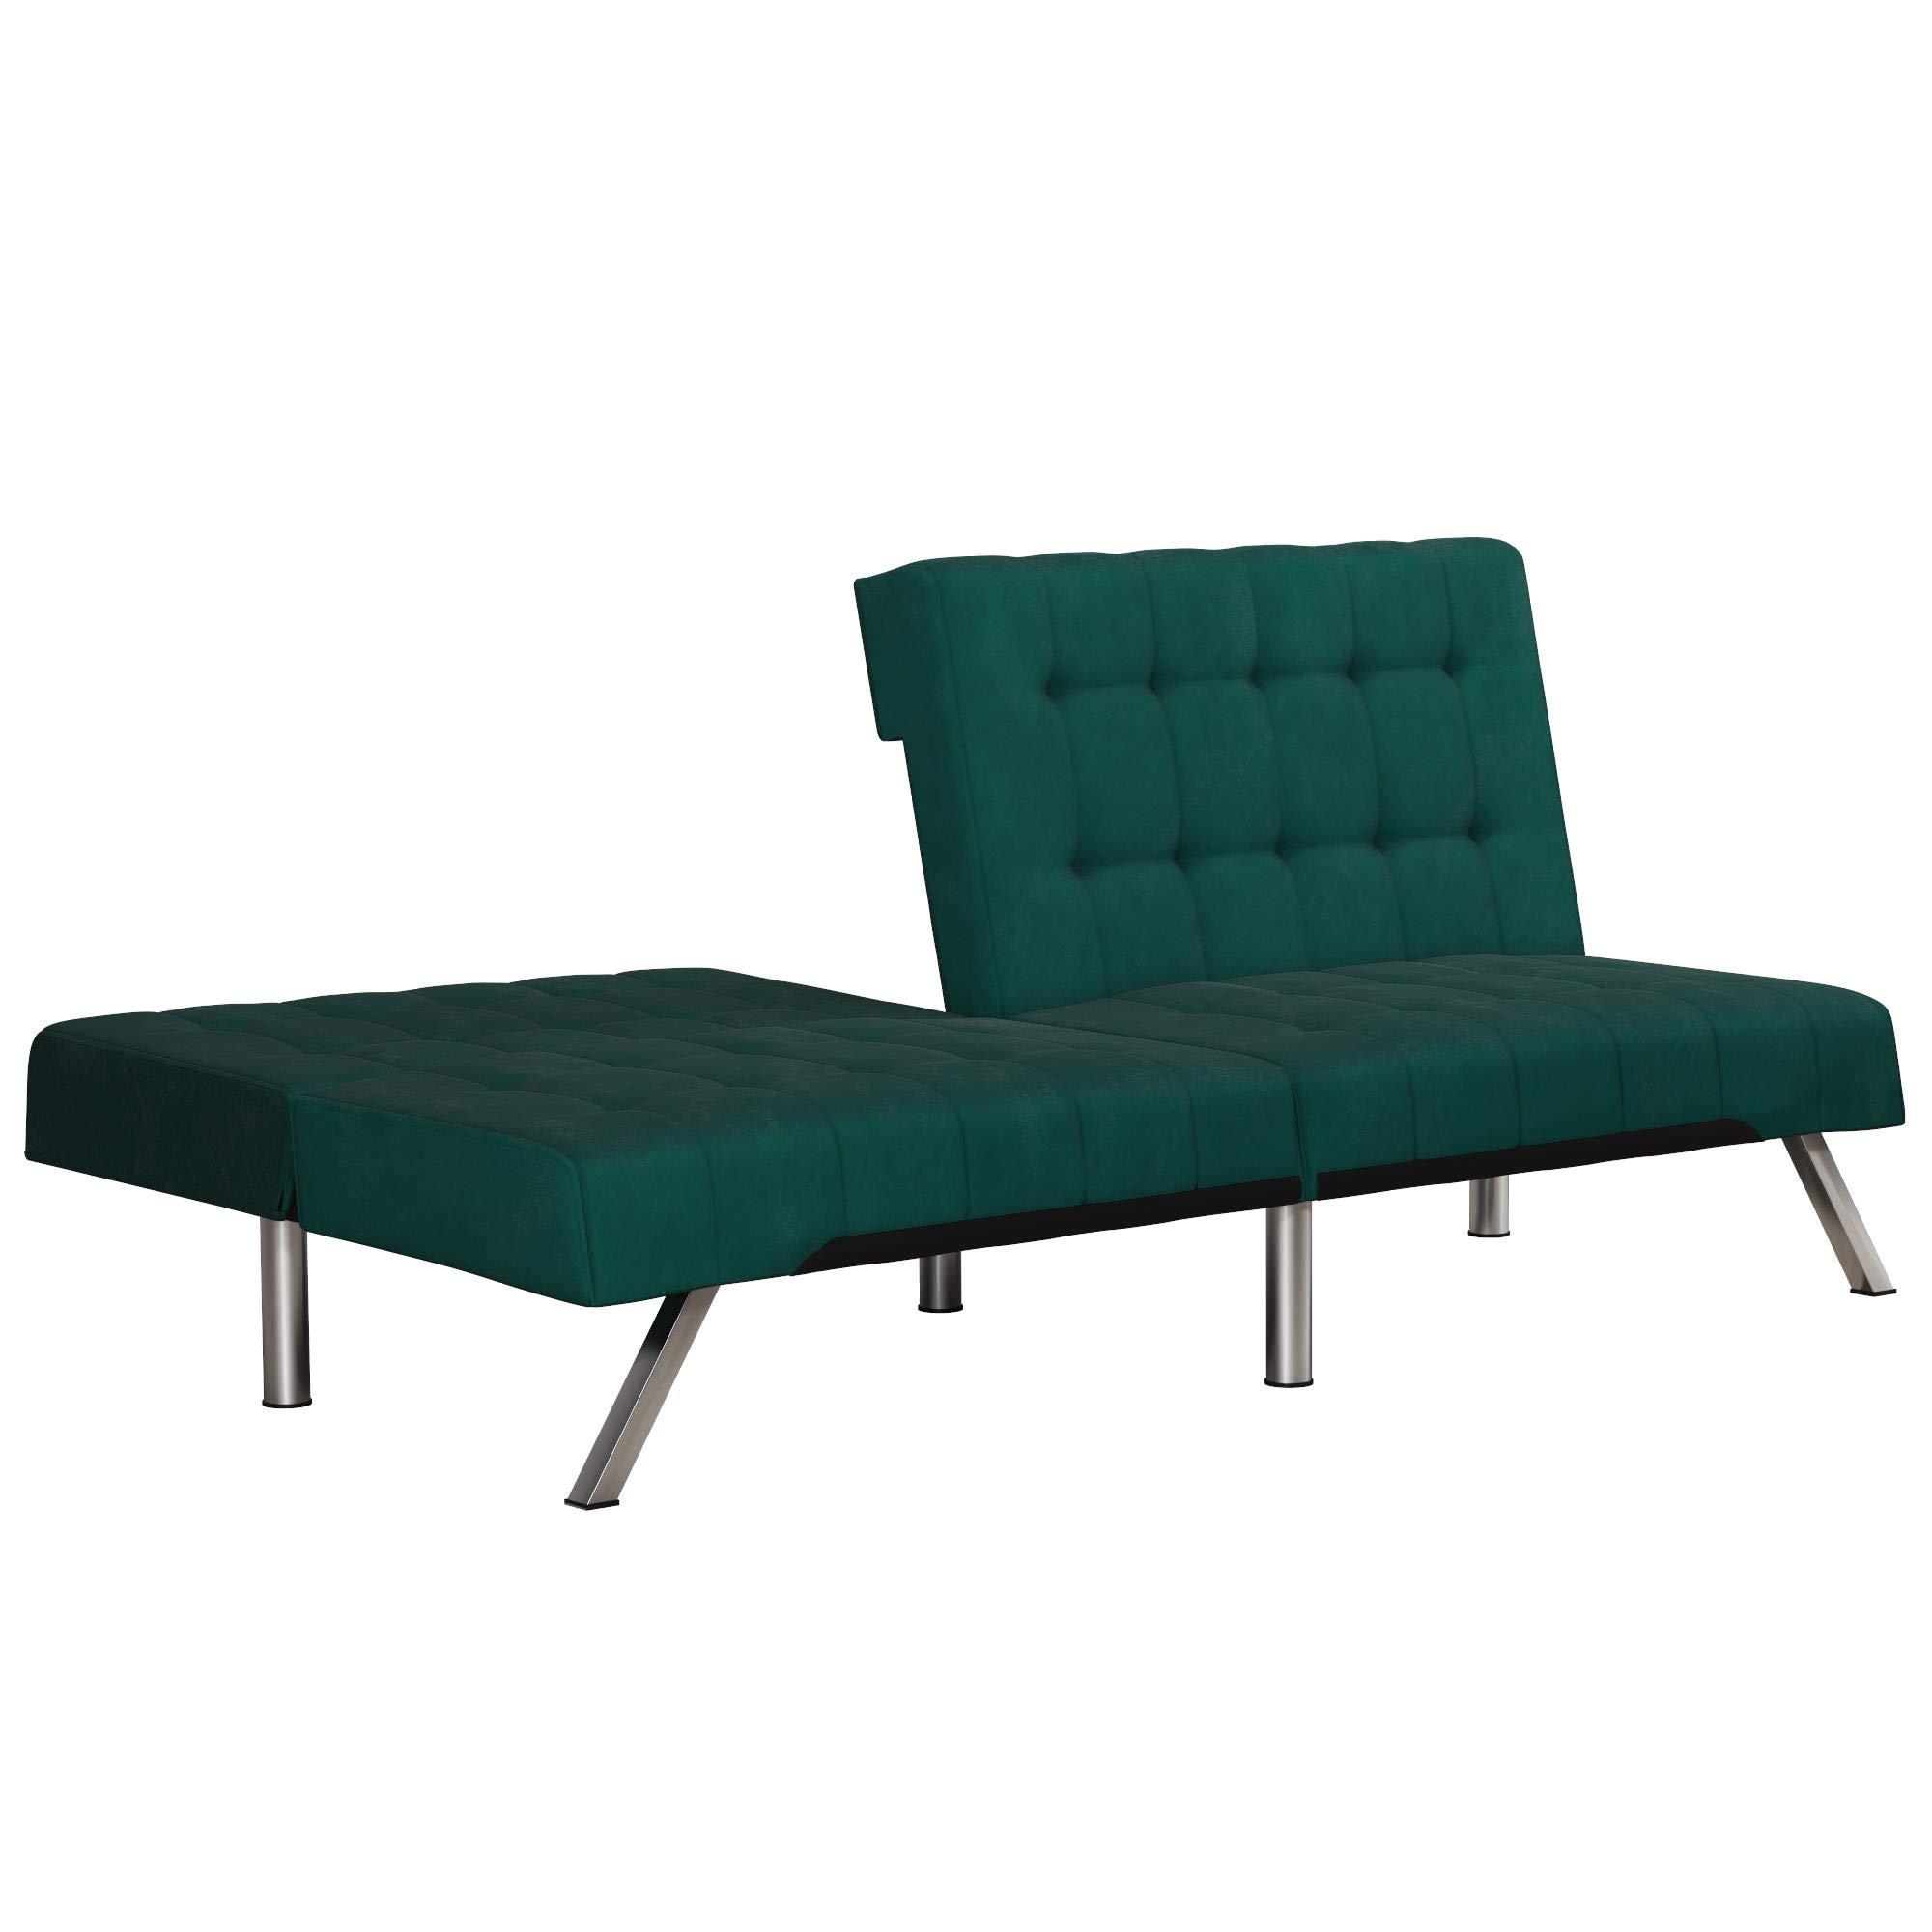 Enjoyable Dhp Emily Futon Sofa Bed Modern Couch Green Velvet Inzonedesignstudio Interior Chair Design Inzonedesignstudiocom